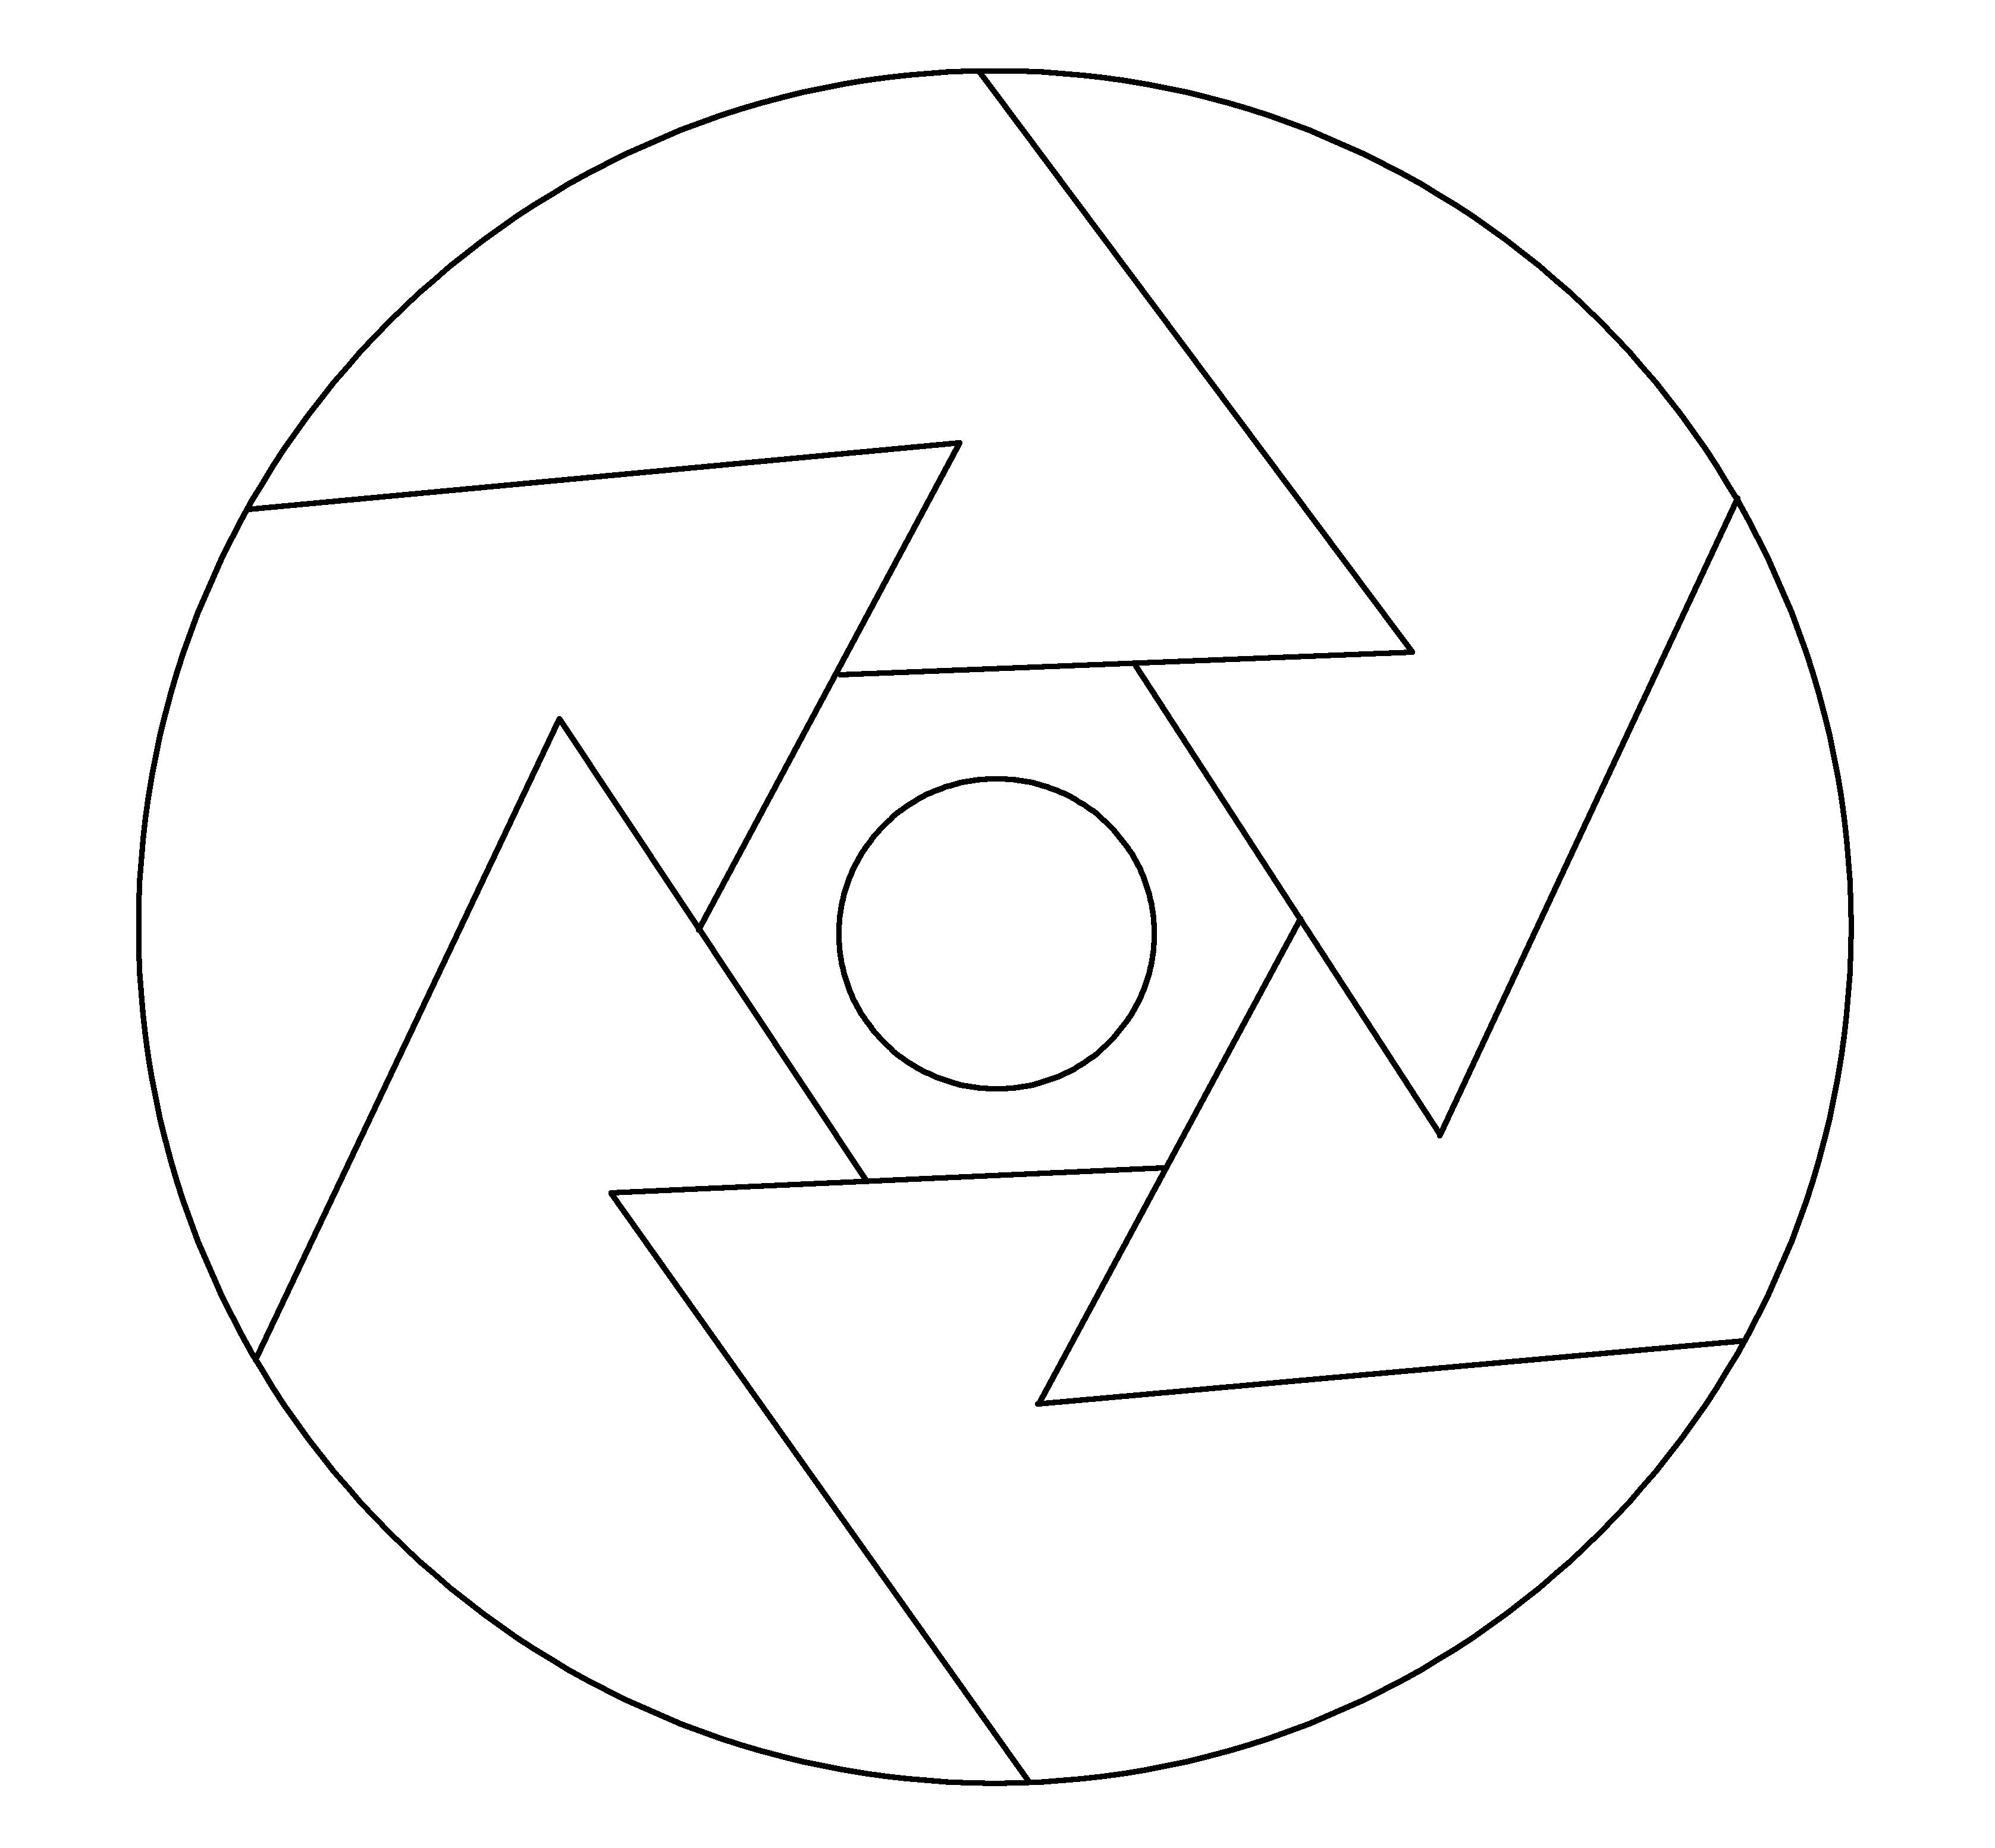 10 mandalas f ciles celina emborg for Comedor facil de dibujar